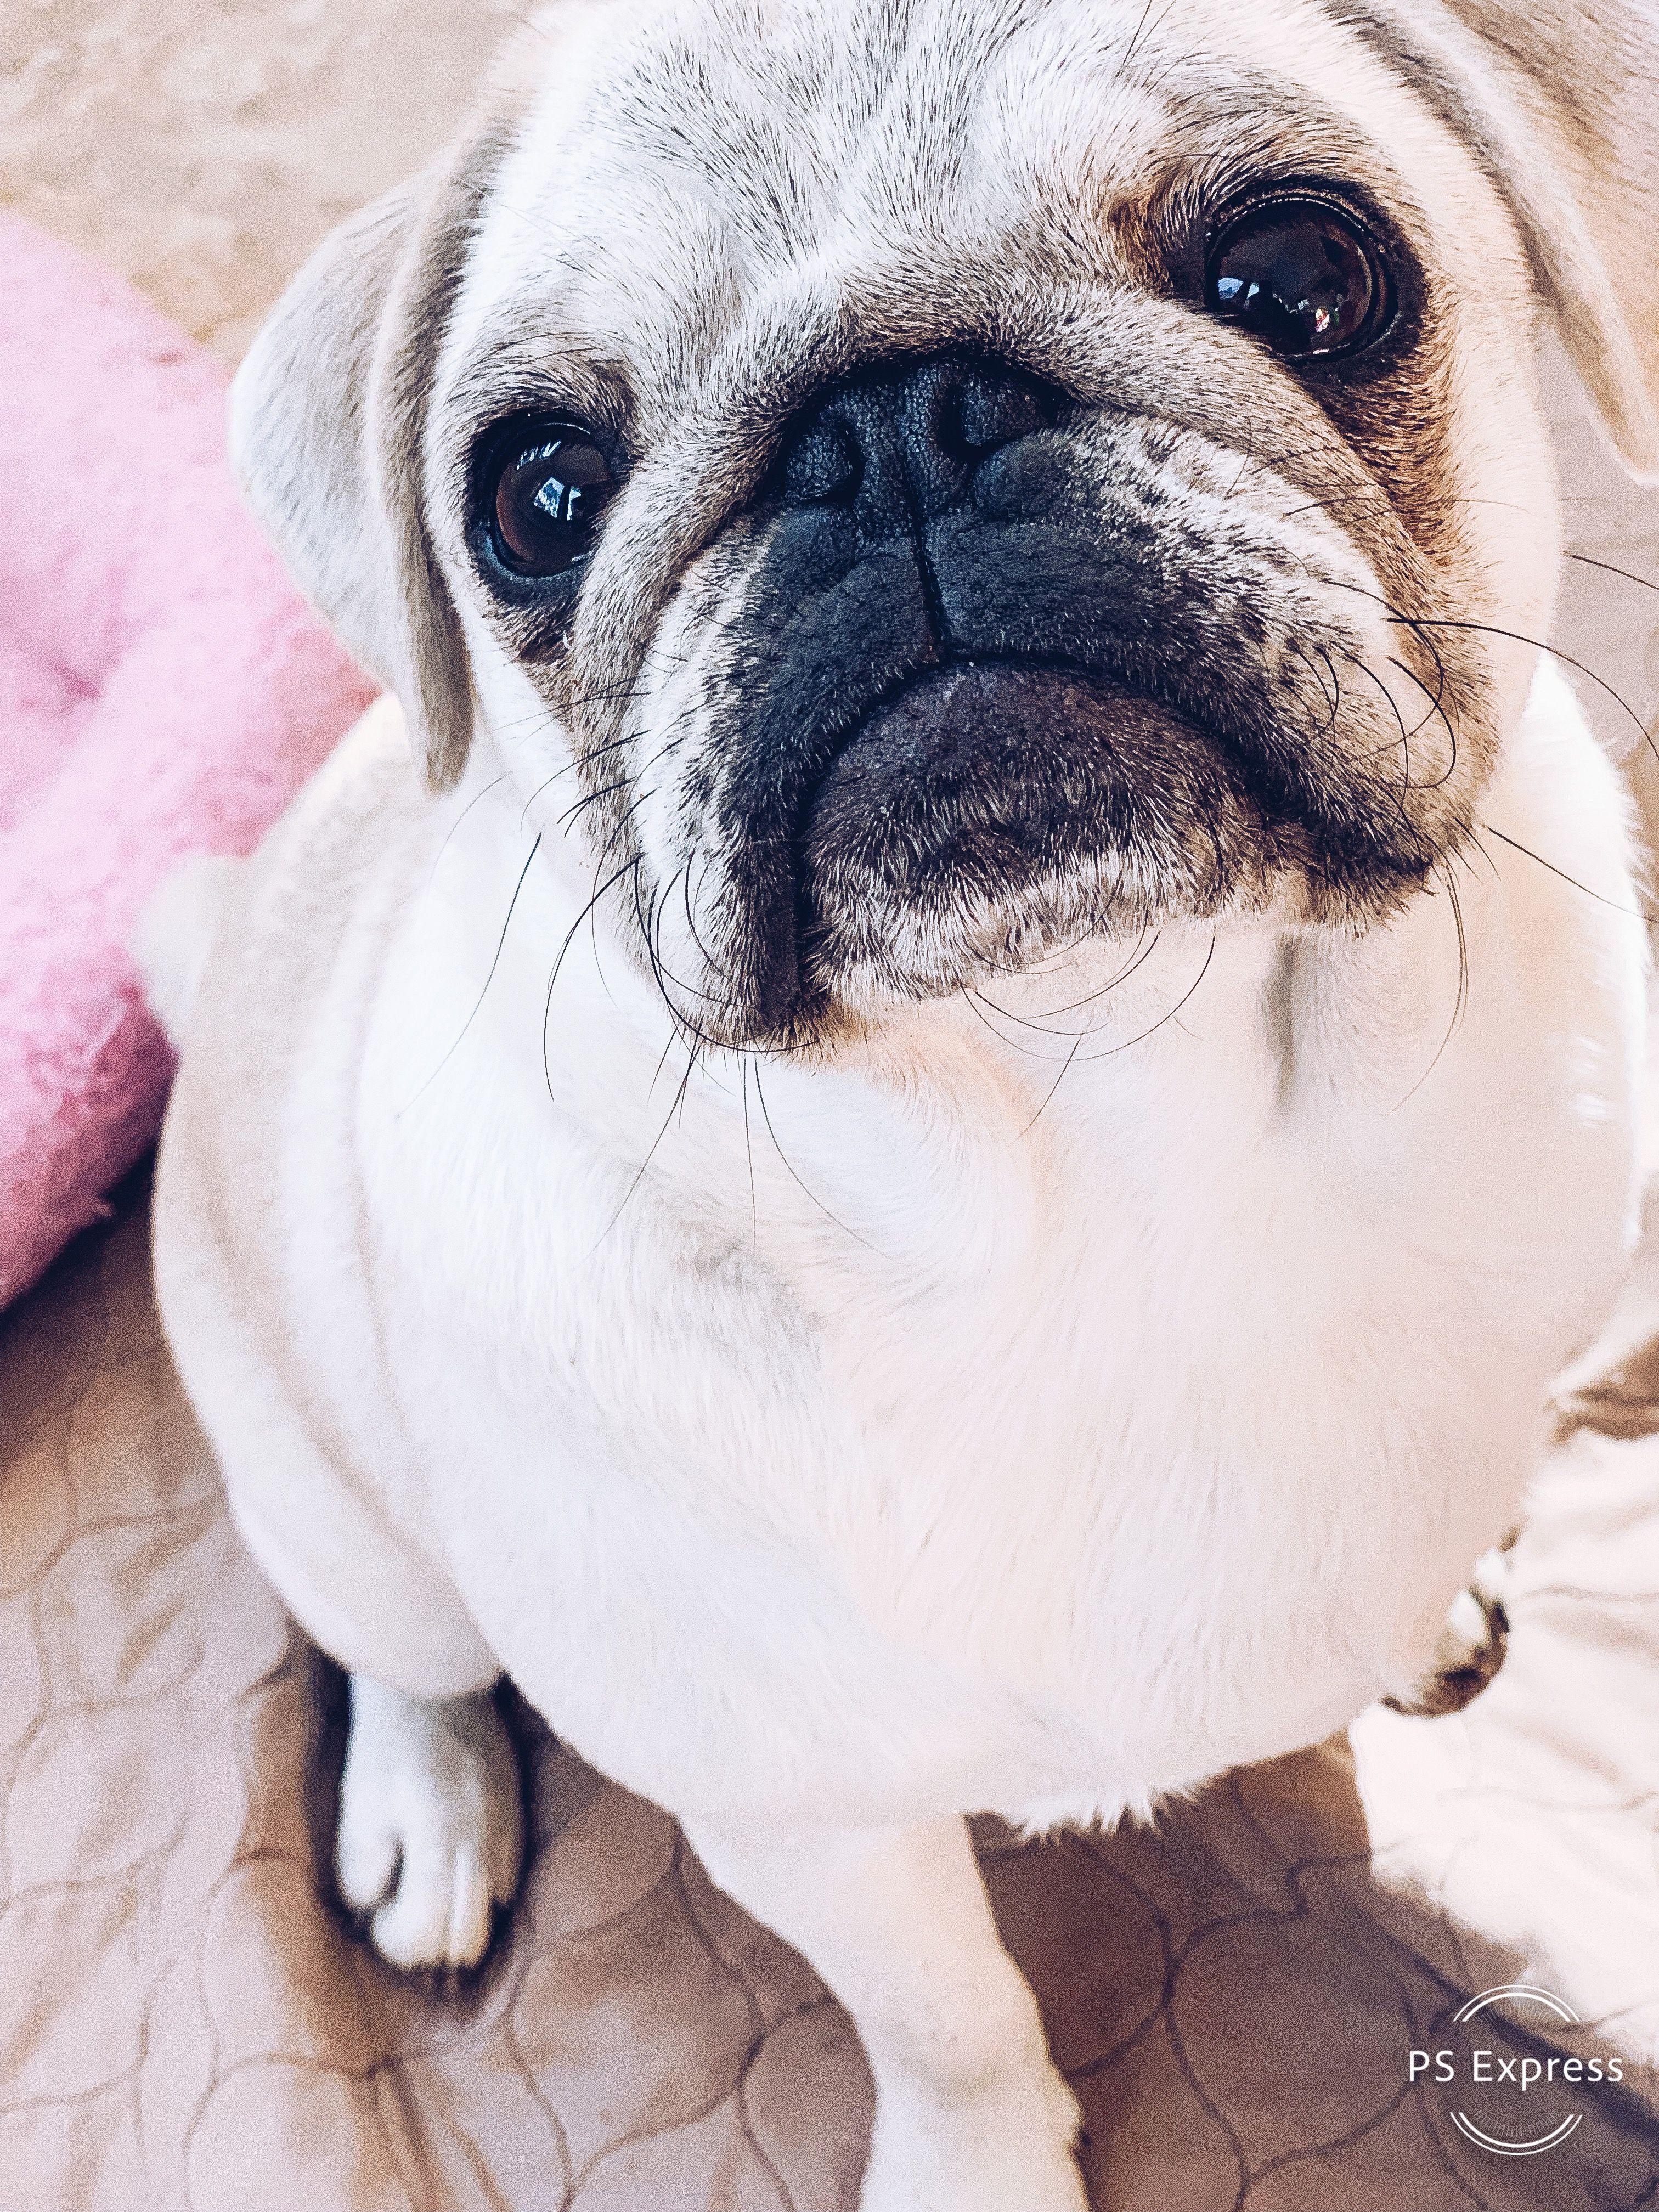 Pin By Nana Covington On Pugs Pugs And More Pugs Little Pets